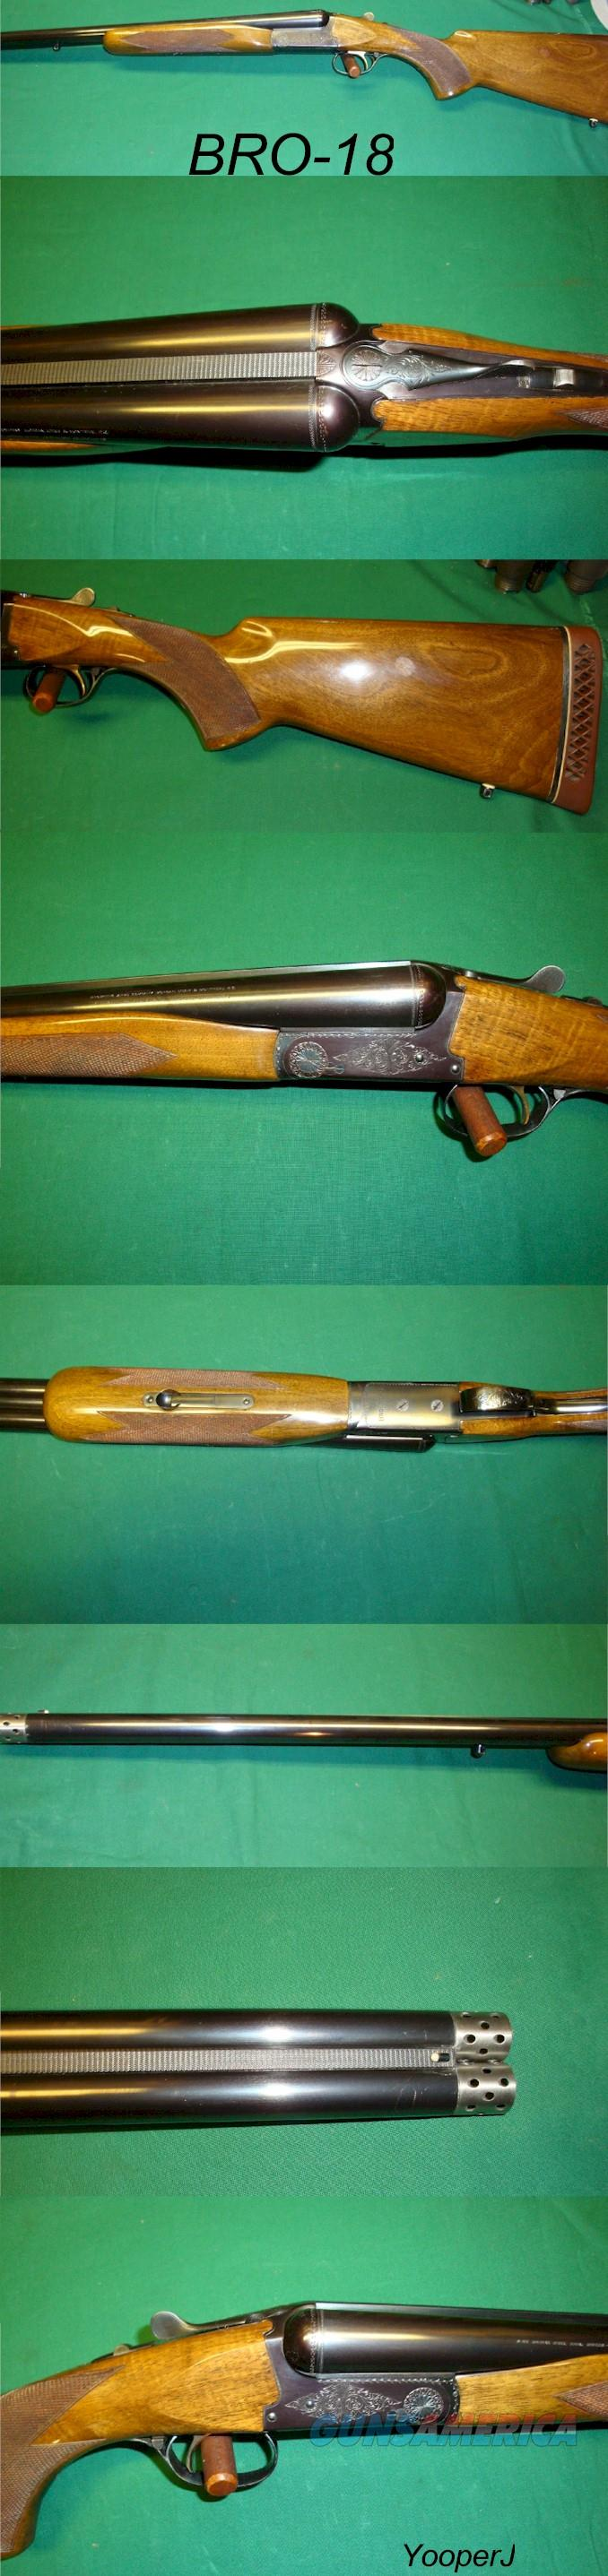 Browning B-SS SxS Single Selective Trigger with choke tubes Reduced price  Guns > Shotguns > Browning Shotguns > Side by Sides